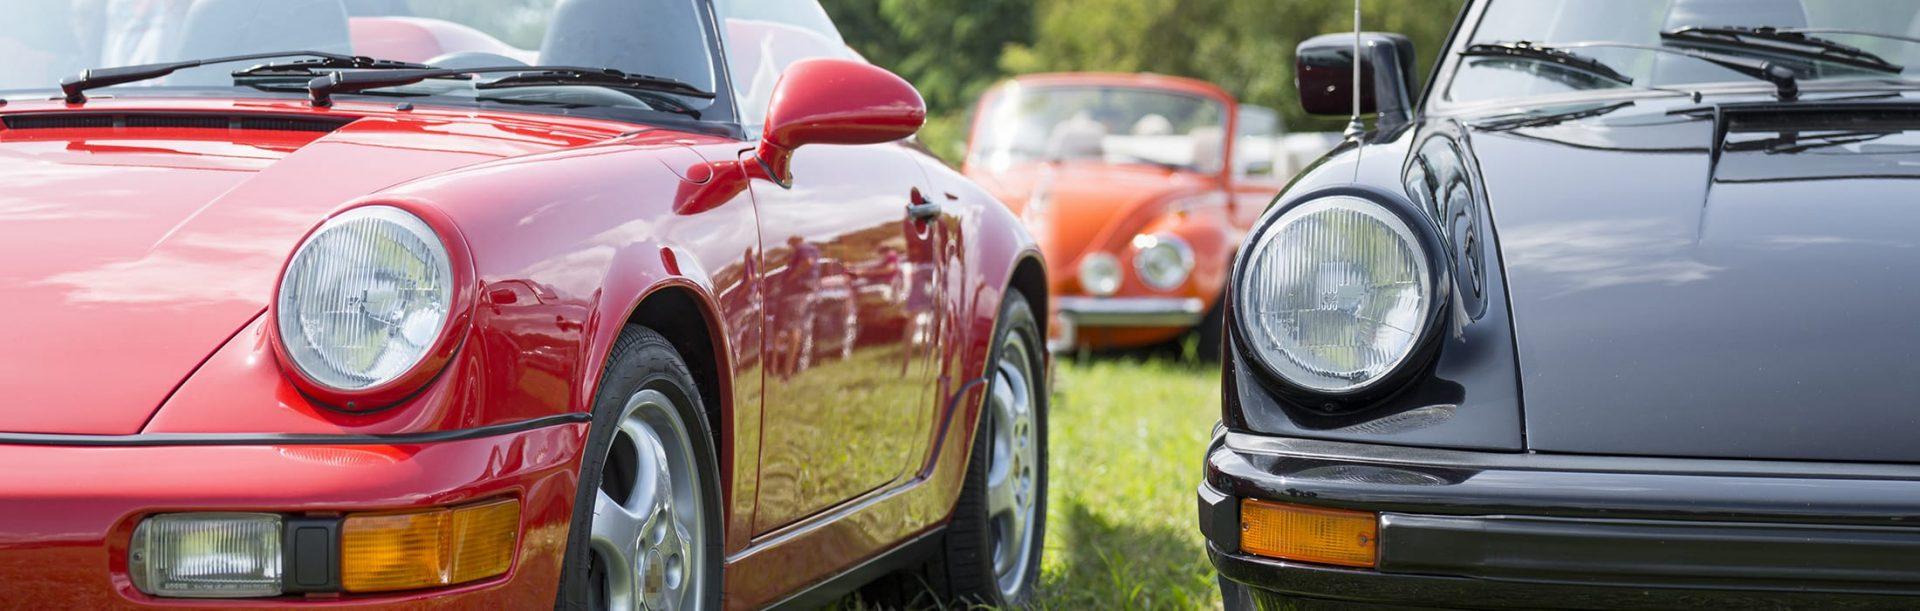 Line of Porsche classic cars